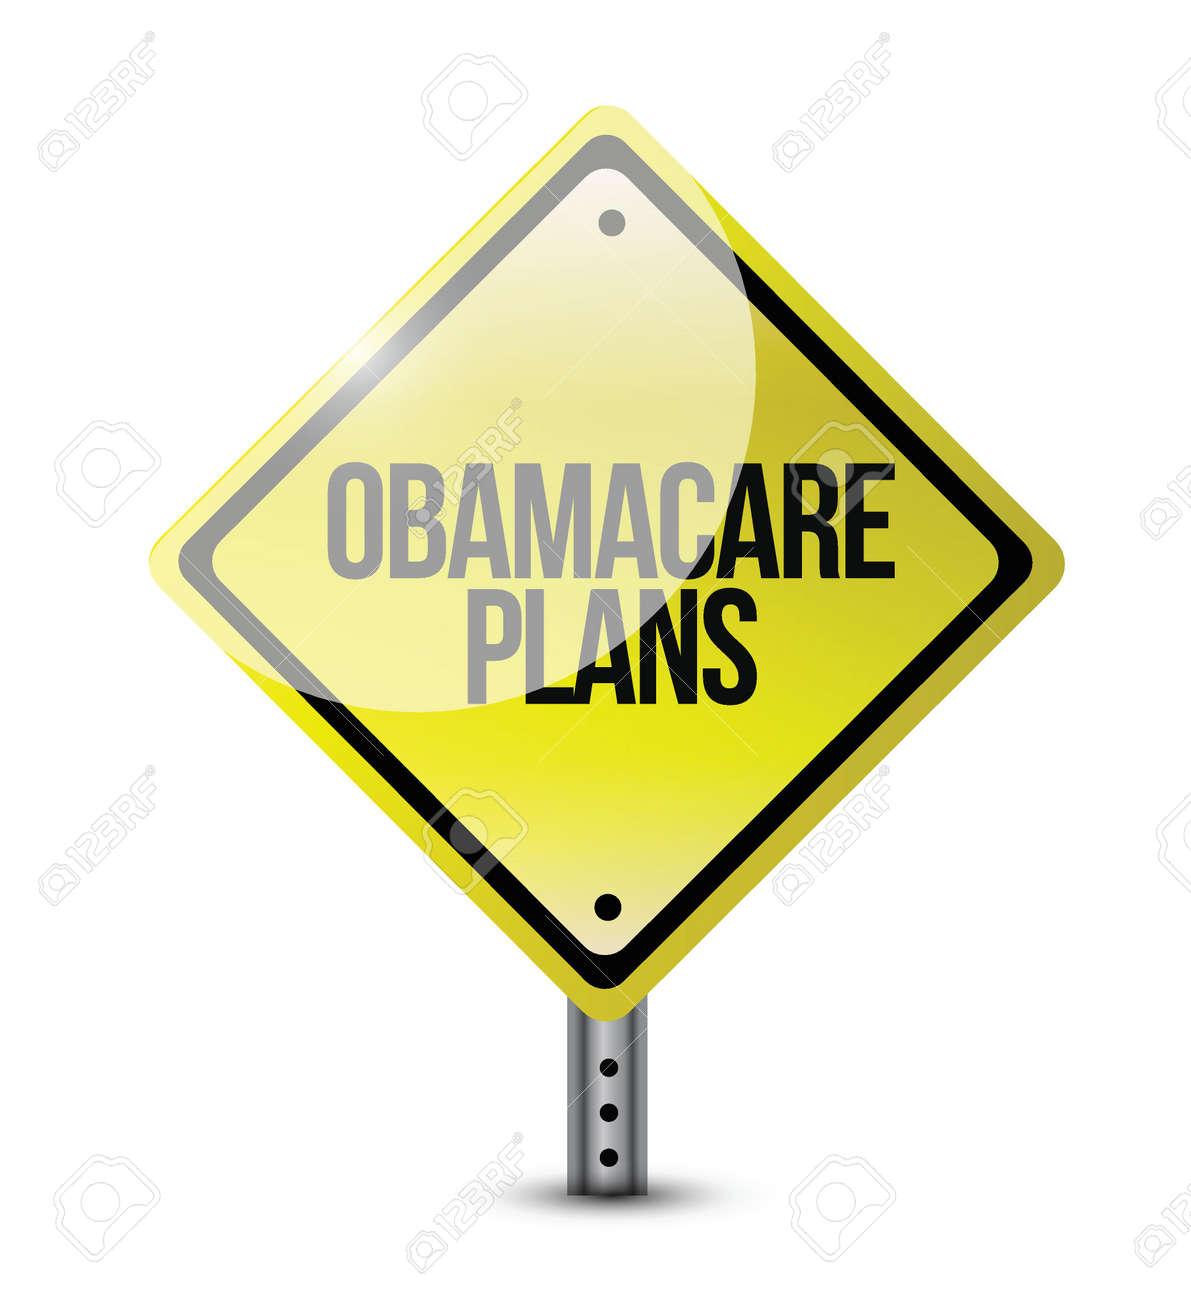 obamacare plans road sign illustration design over white Stock Vector - 23057677